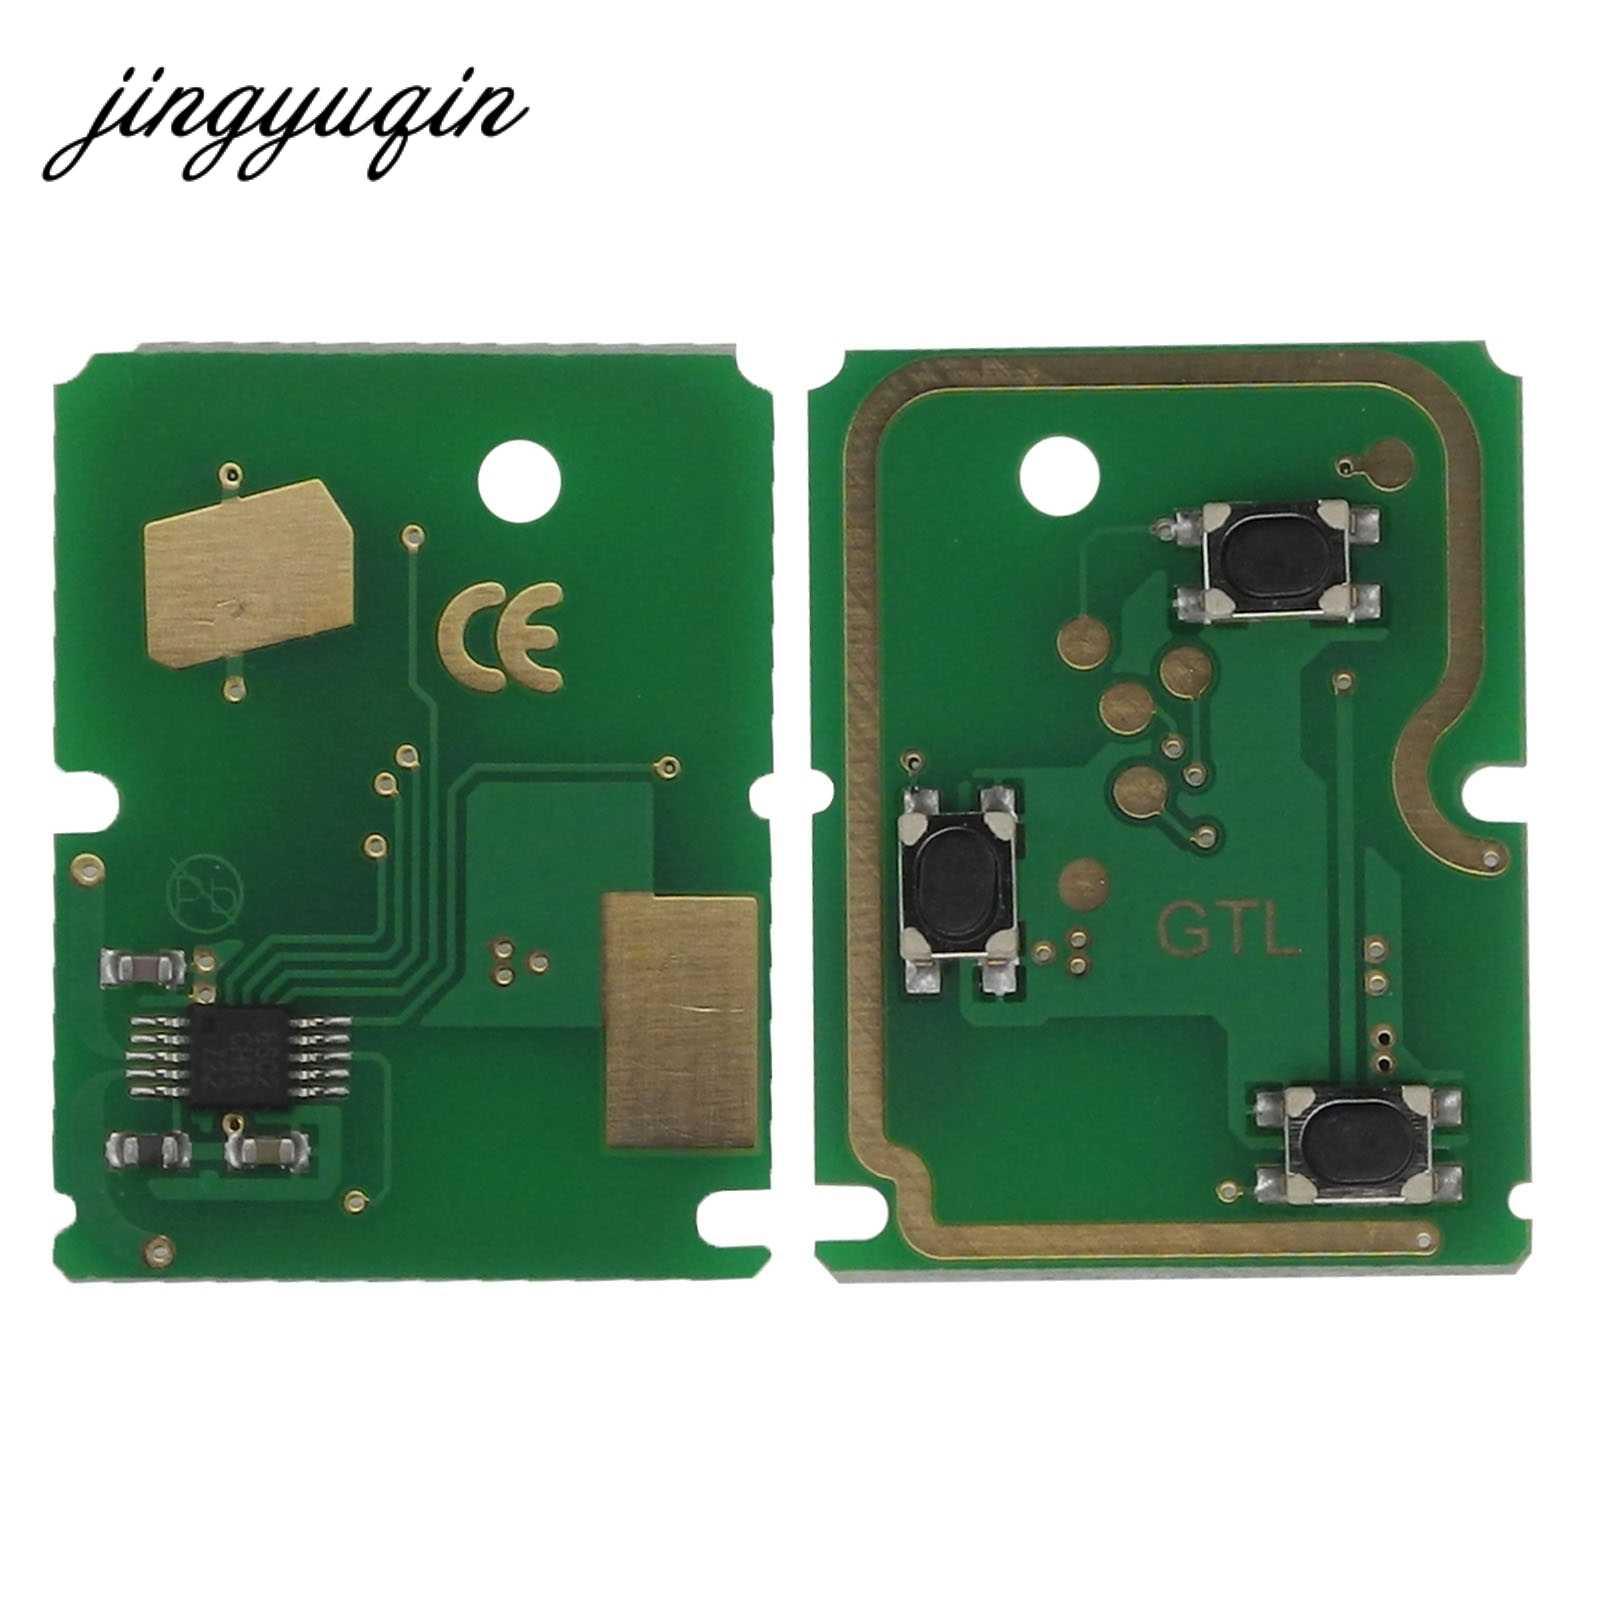 Jingyuqin 3 أزرار مفتاح السيارة عن بعد 315/433Mhz لفورد فوكس فييستا فيوجن C-ماكس مونديو غالاكسي C-ماكس S-Max ID60 4D63 رقاقة